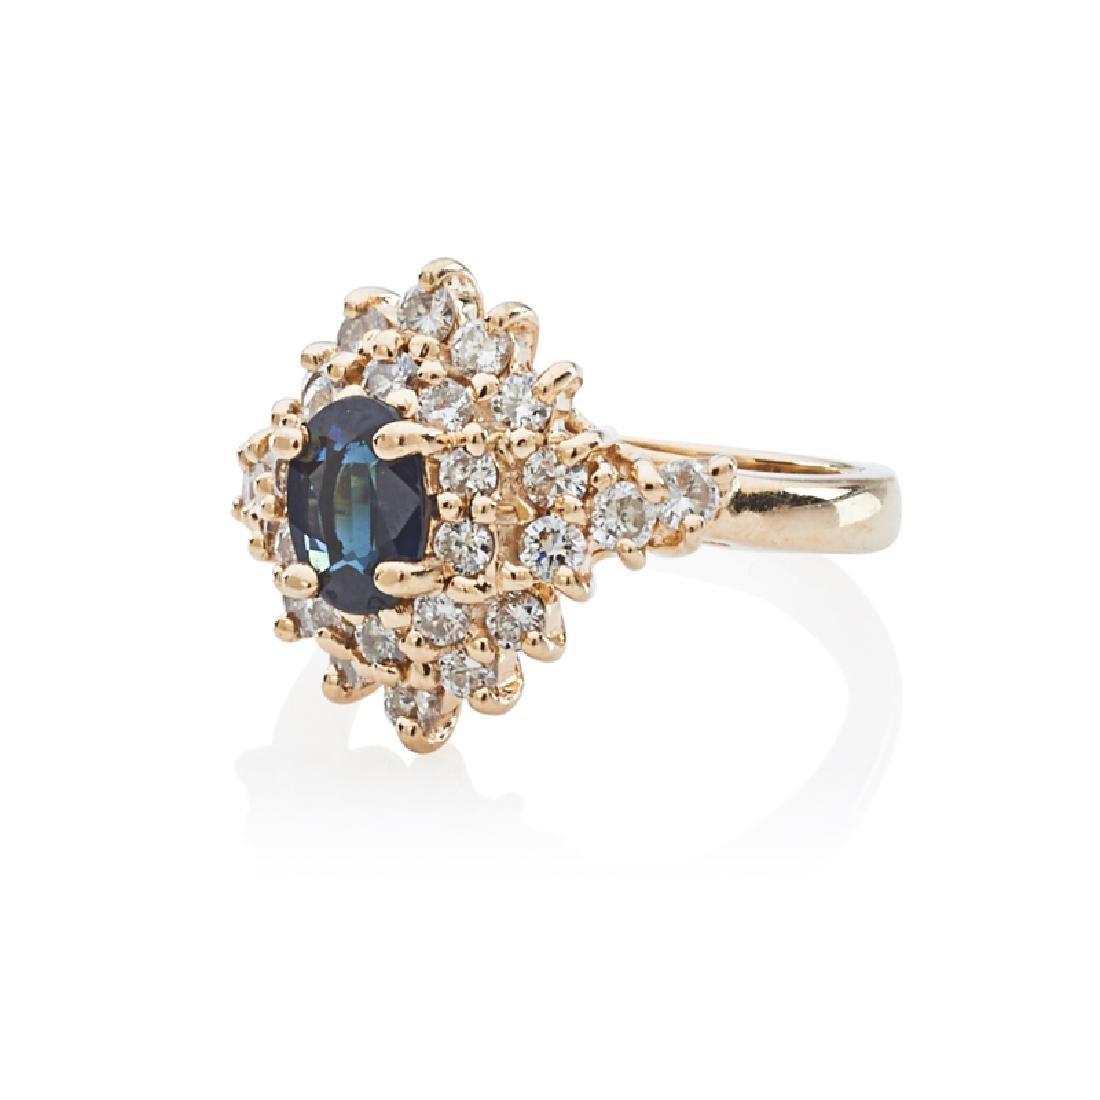 SAPPHIRE, DIAMOND & YELLOW GOLD RING